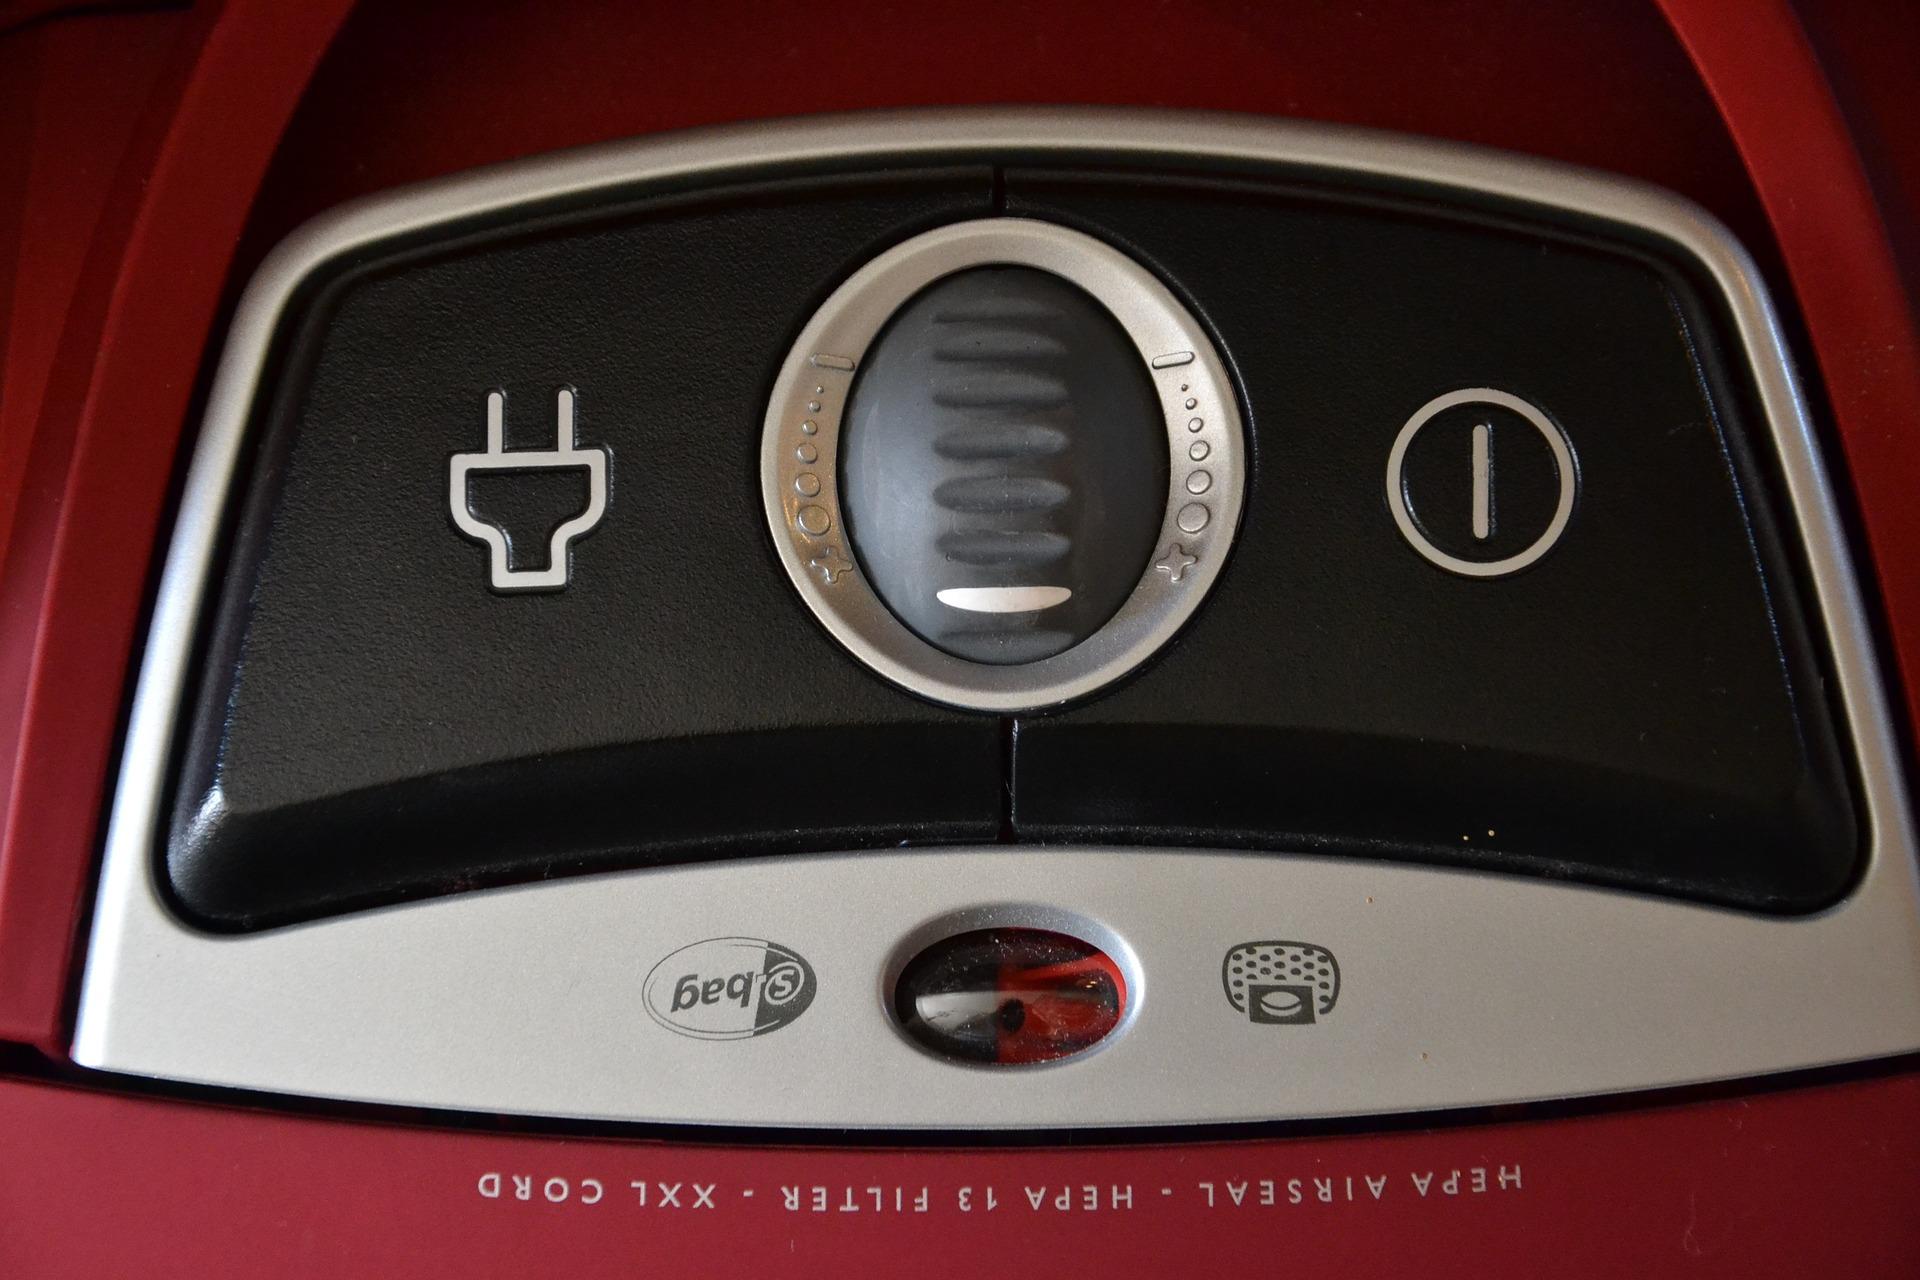 LG HOM-BOT Turbo+ - Un robot que limpia y vigila tu hogar